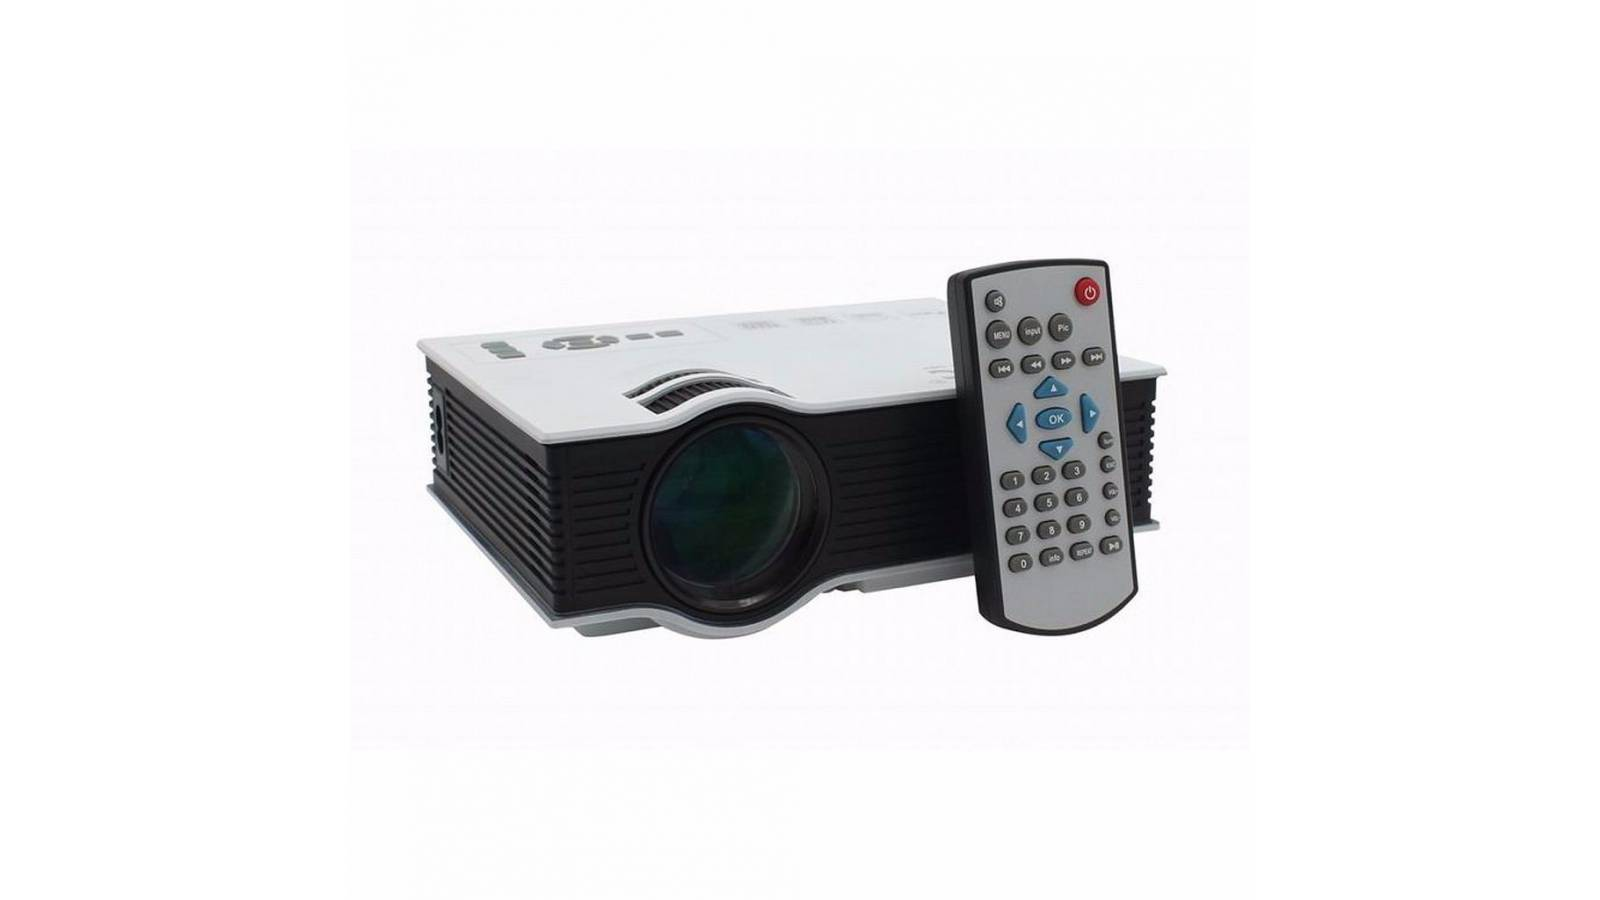 Proyector Led Full Hd 1080p 800 Lumens Hdmi Vga